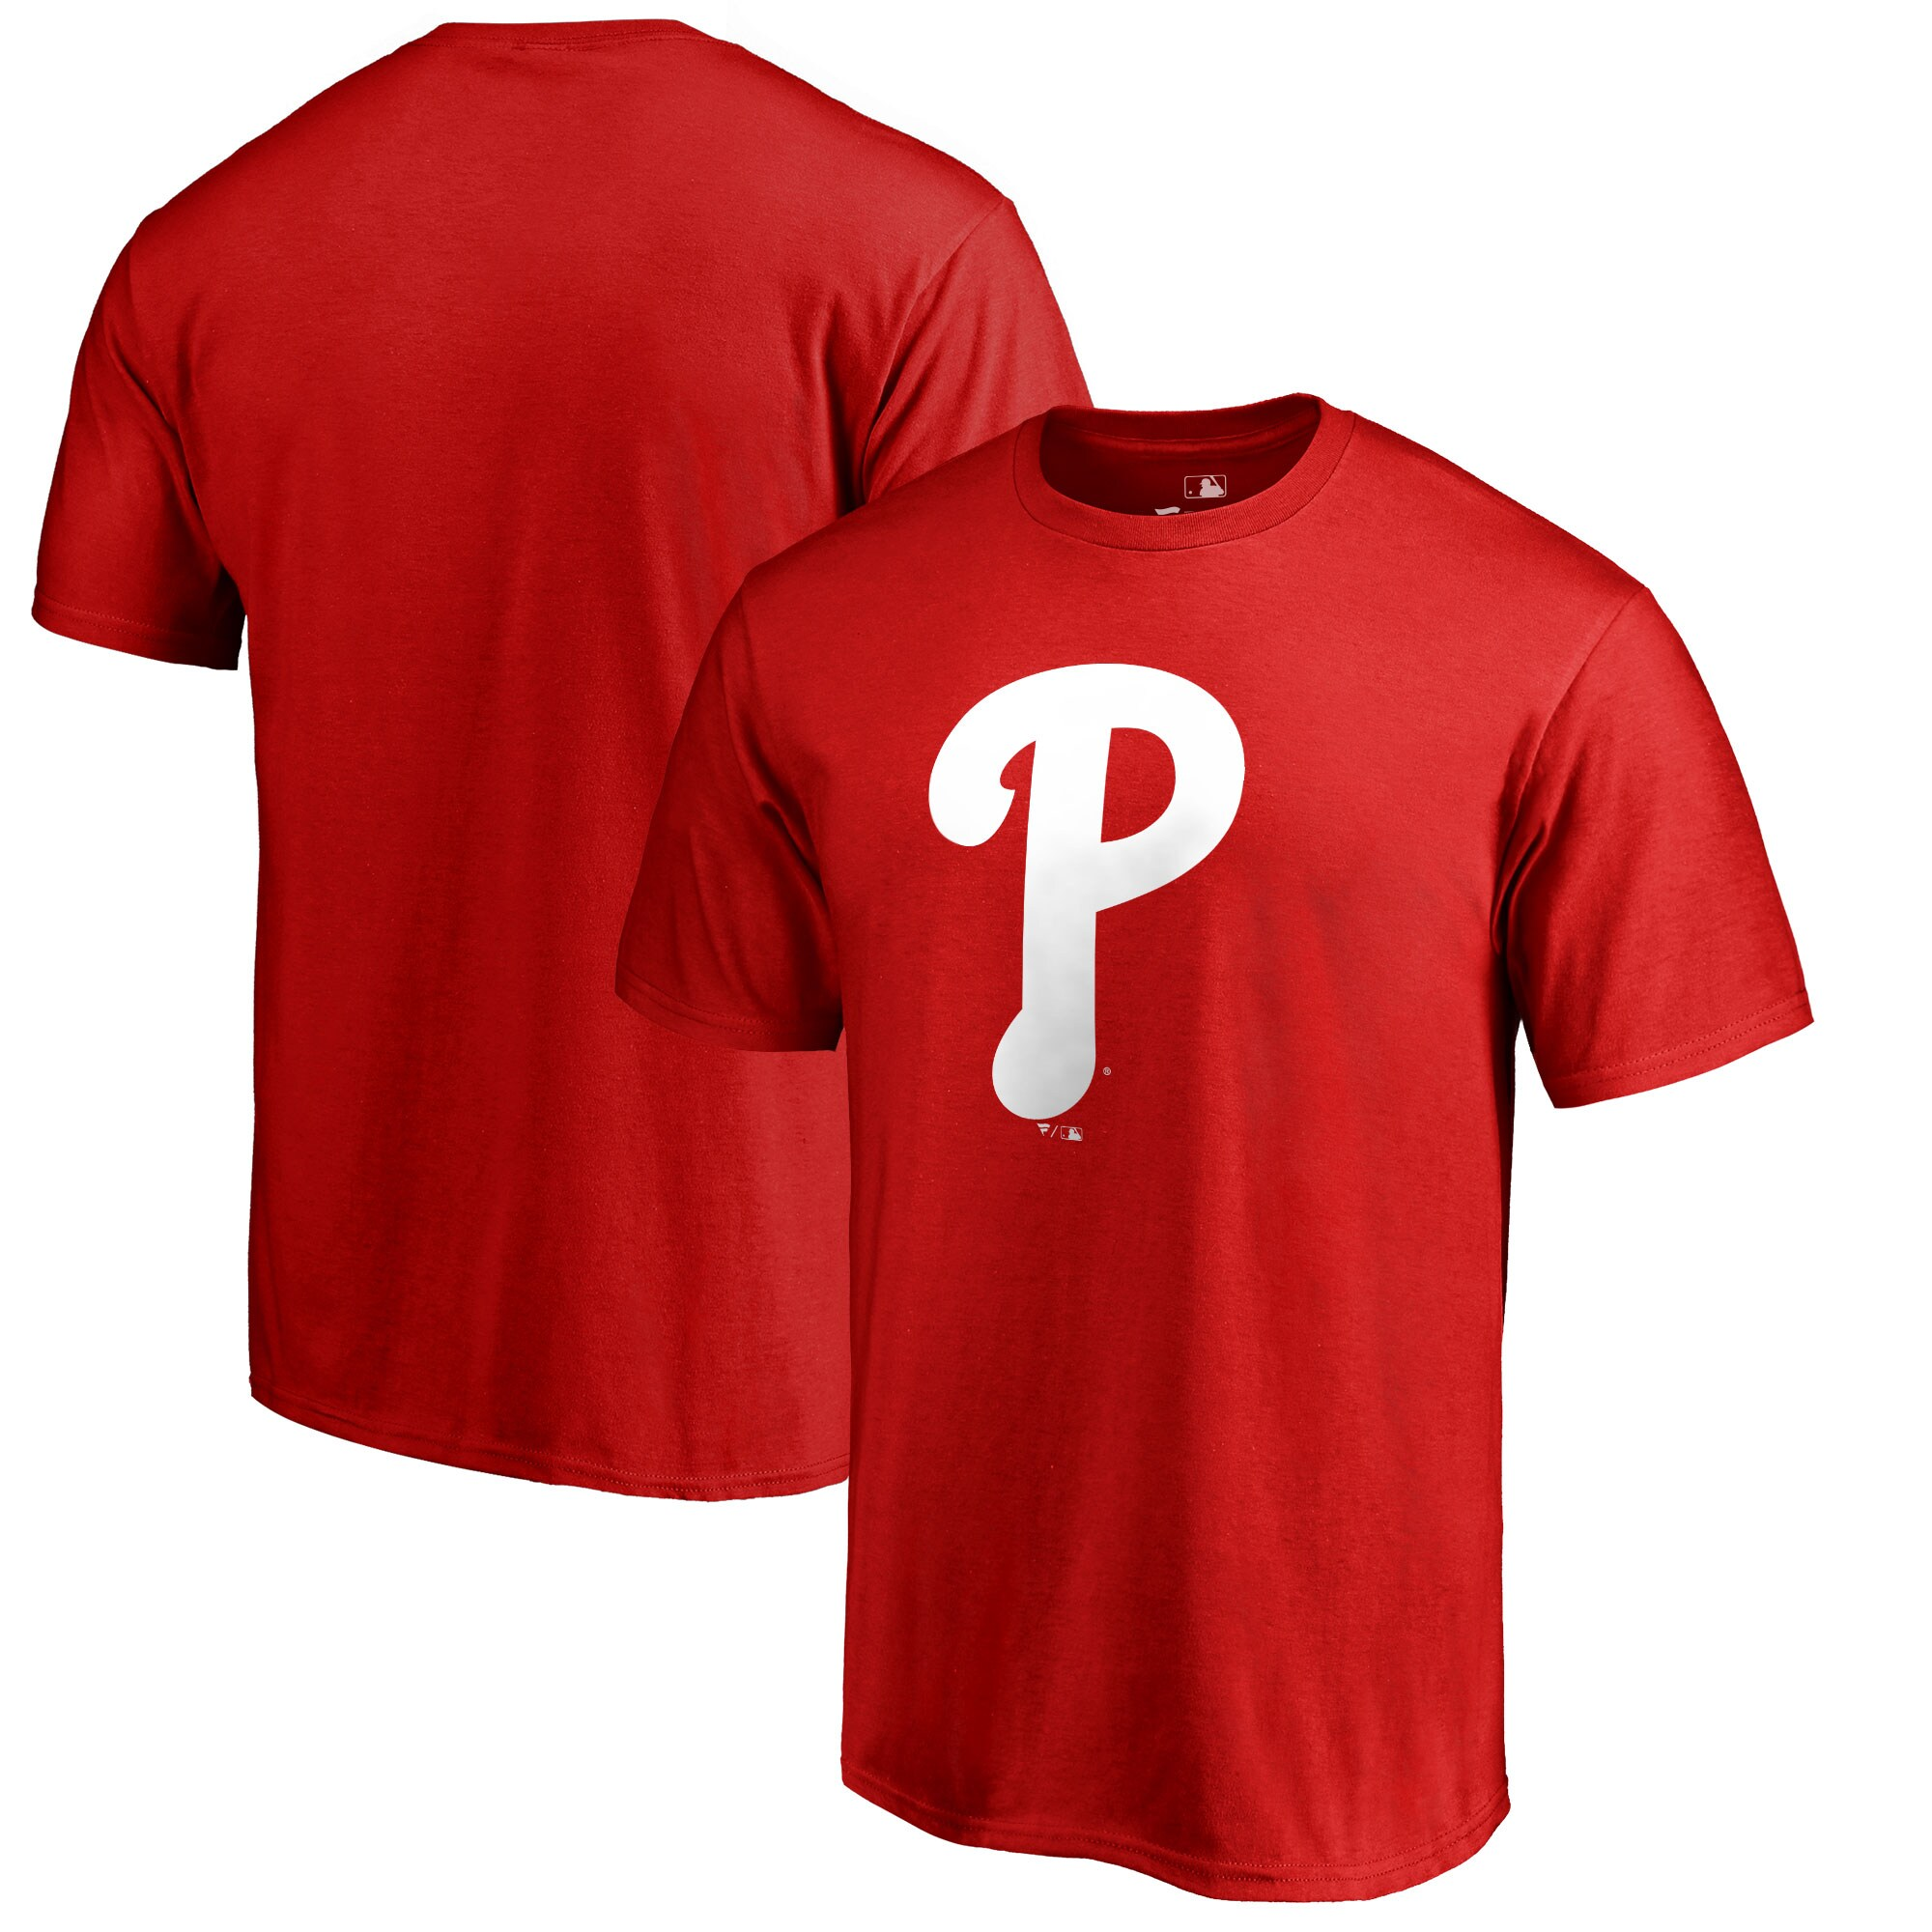 Philadelphia Phillies Big & Tall Primary Team Logo T-Shirt - Red